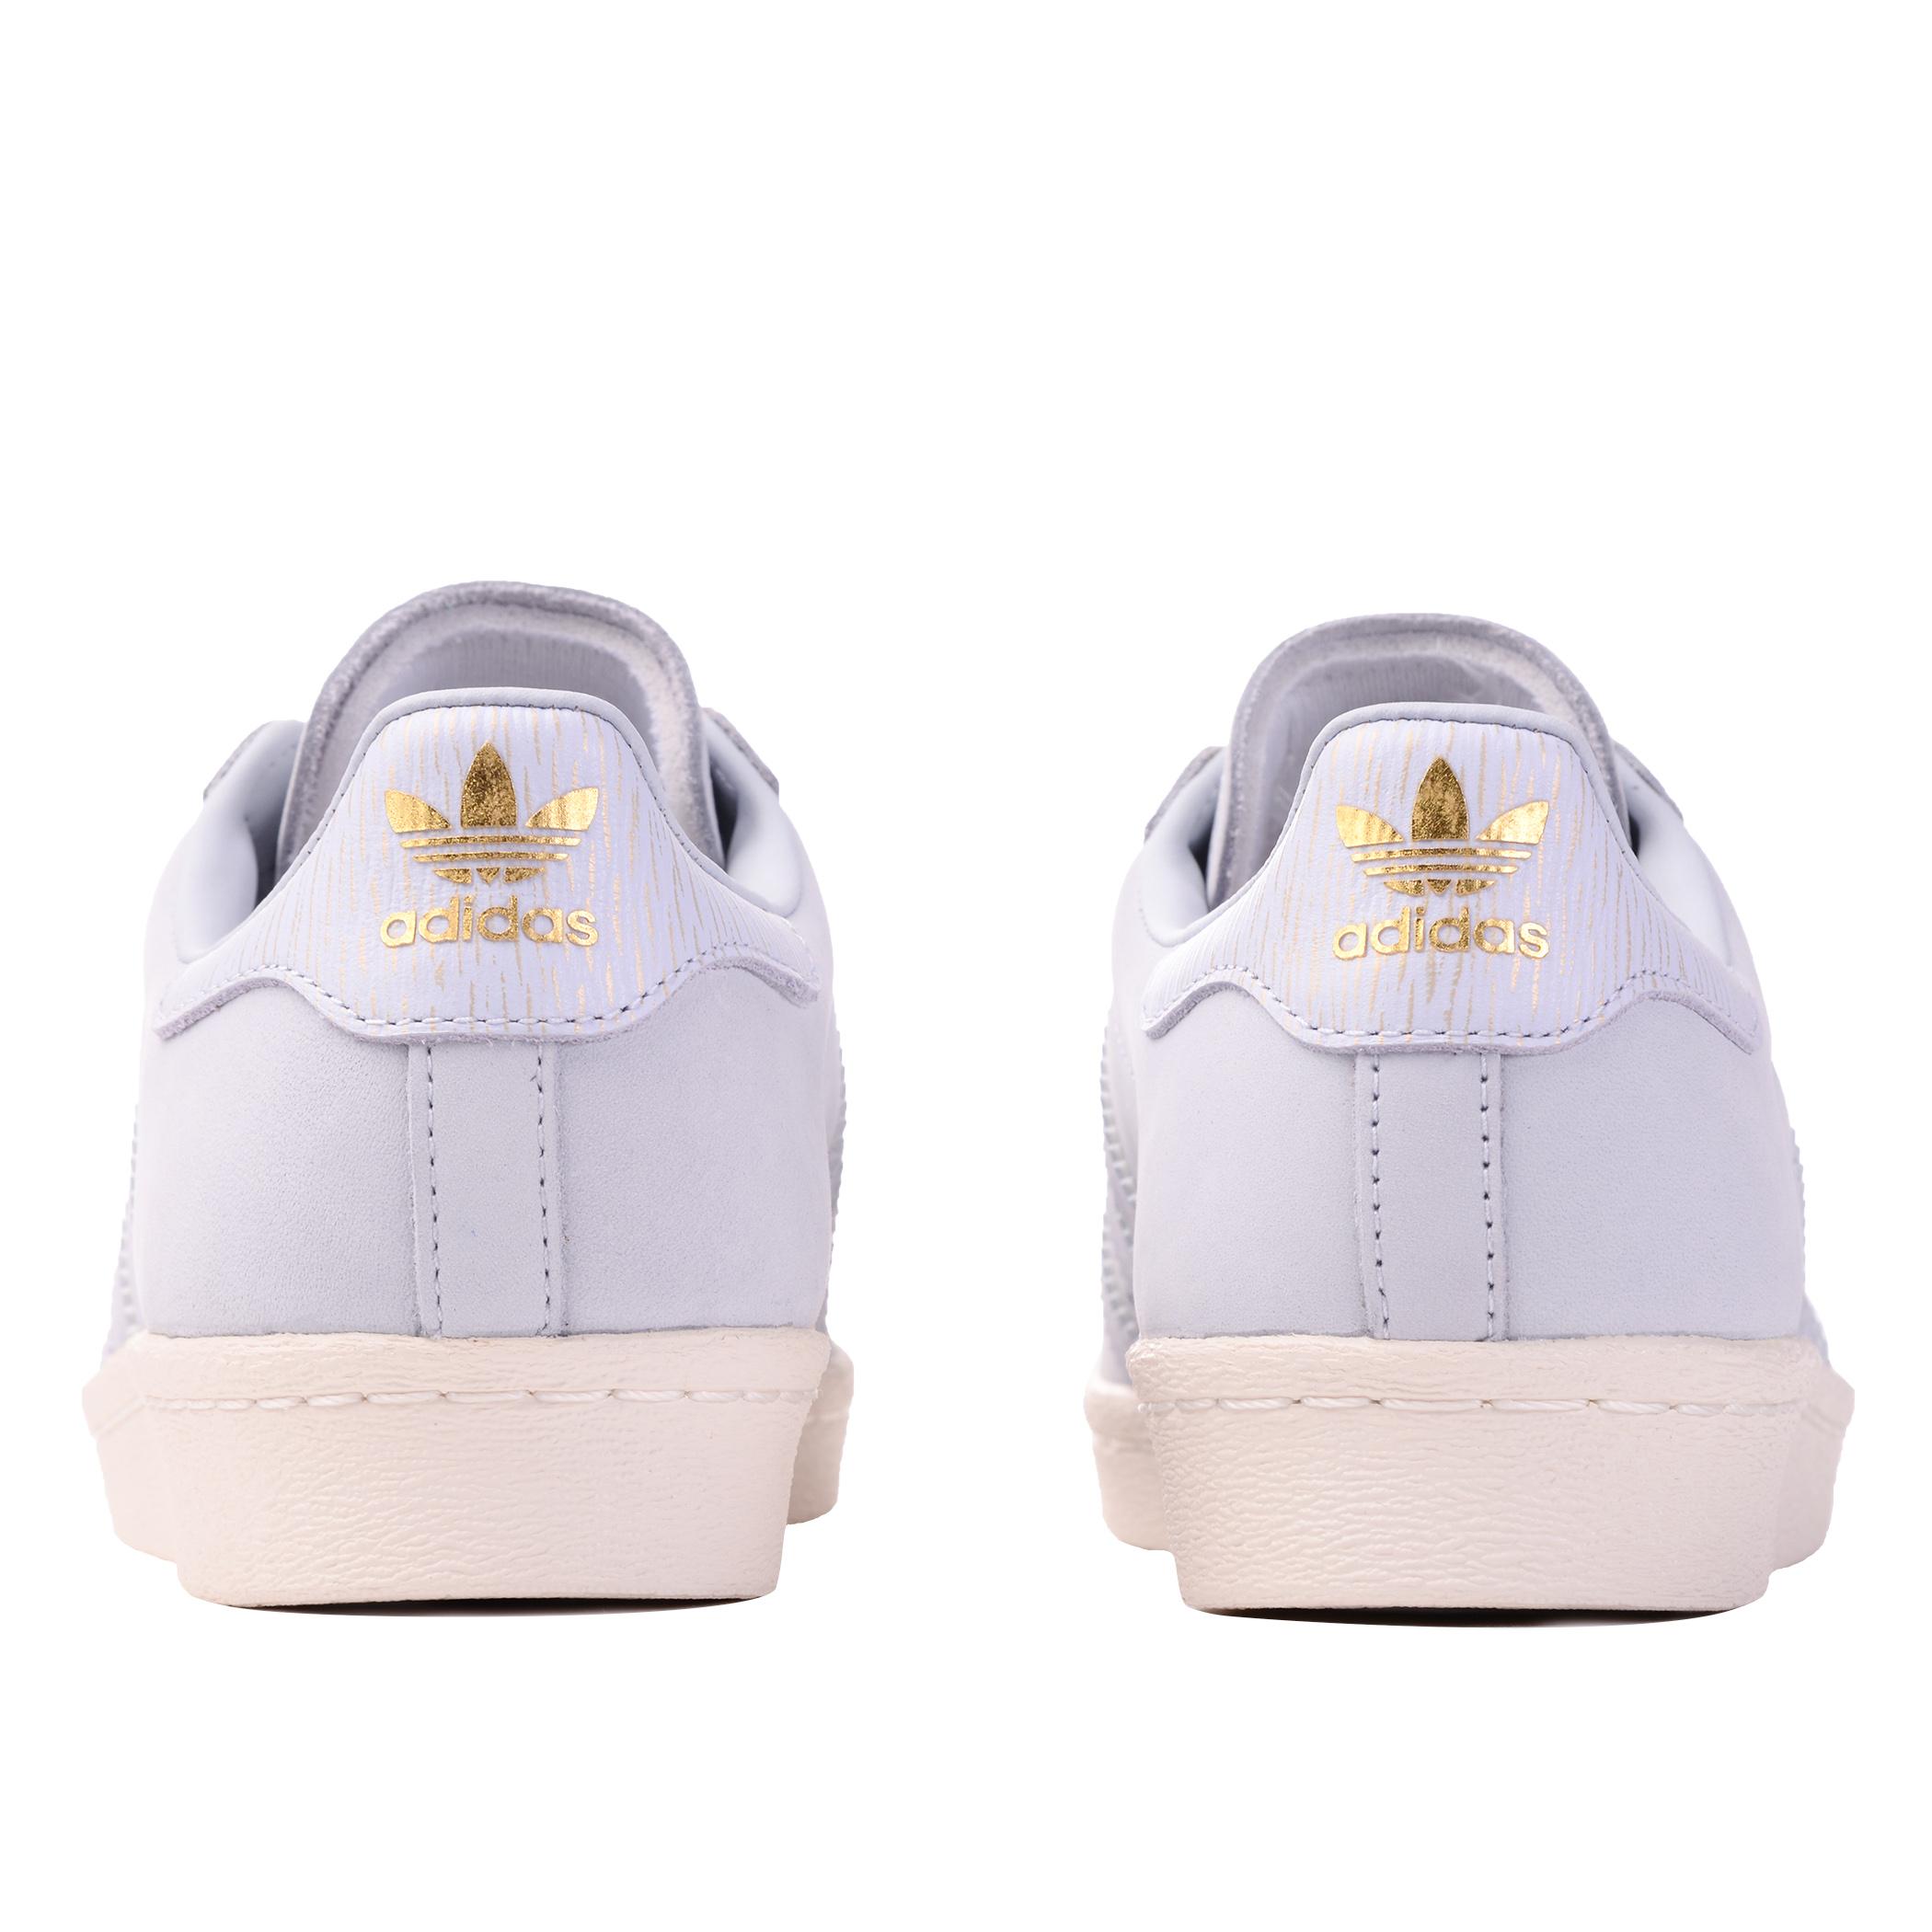 ????????? Superstar ?? adidas Originals (B41520) ???????